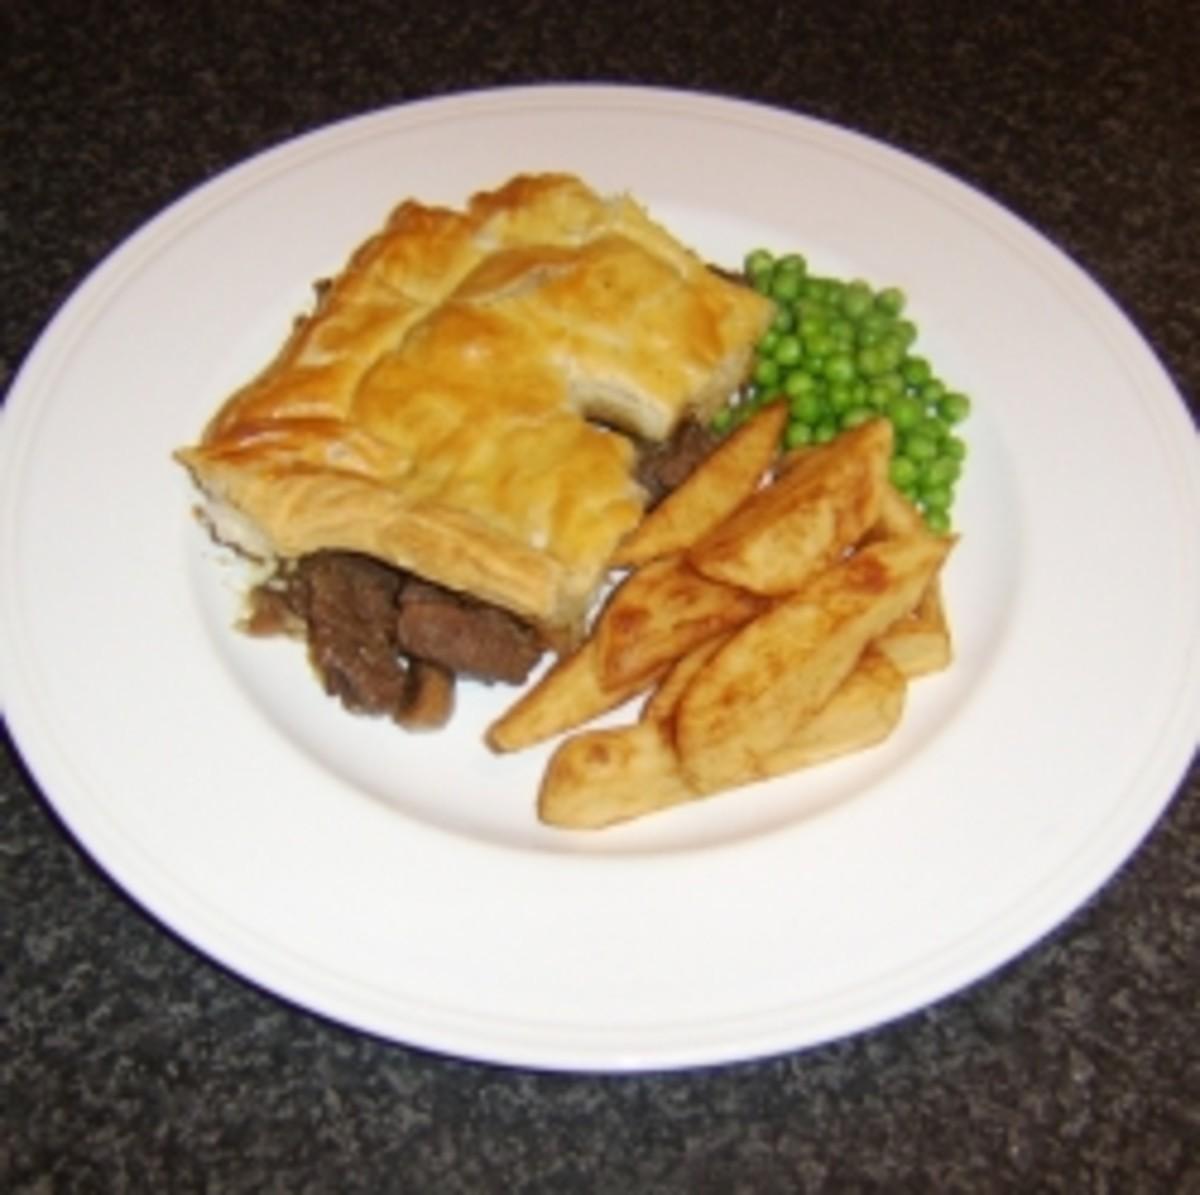 Homemade Steak and Kidney Pie